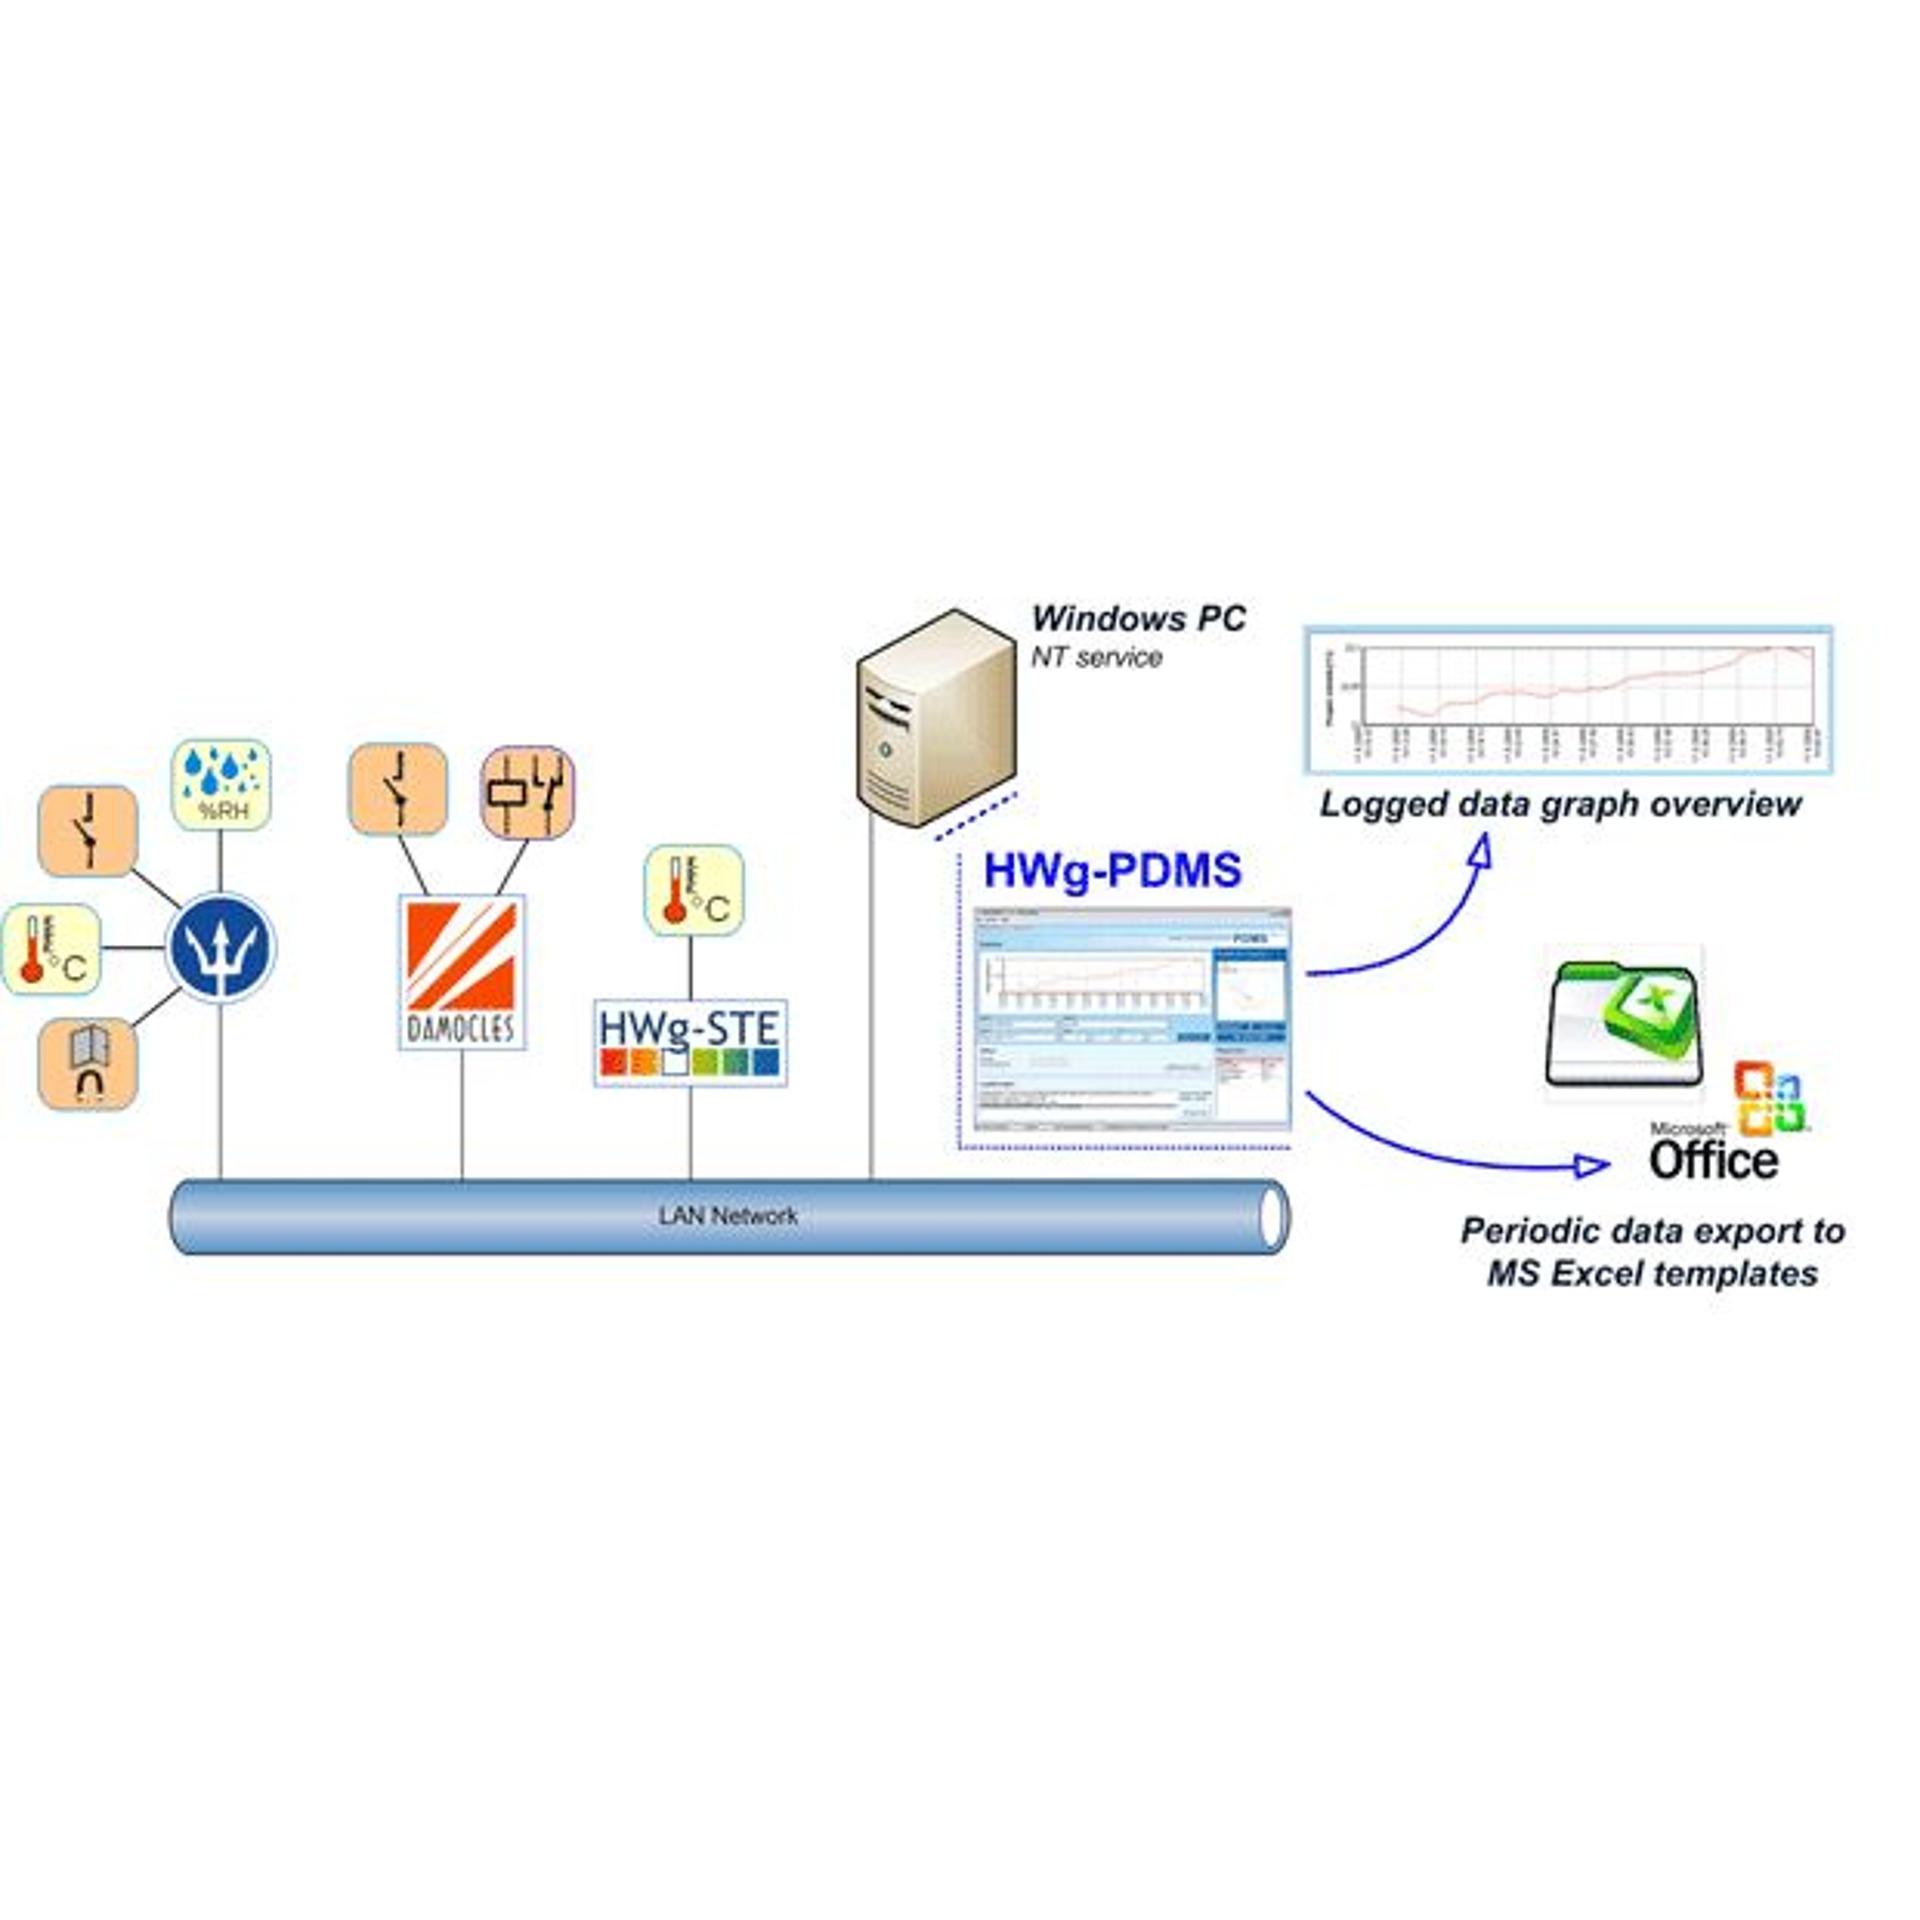 HWg-PDMS - Monitoring Software - HW group - BellEquip